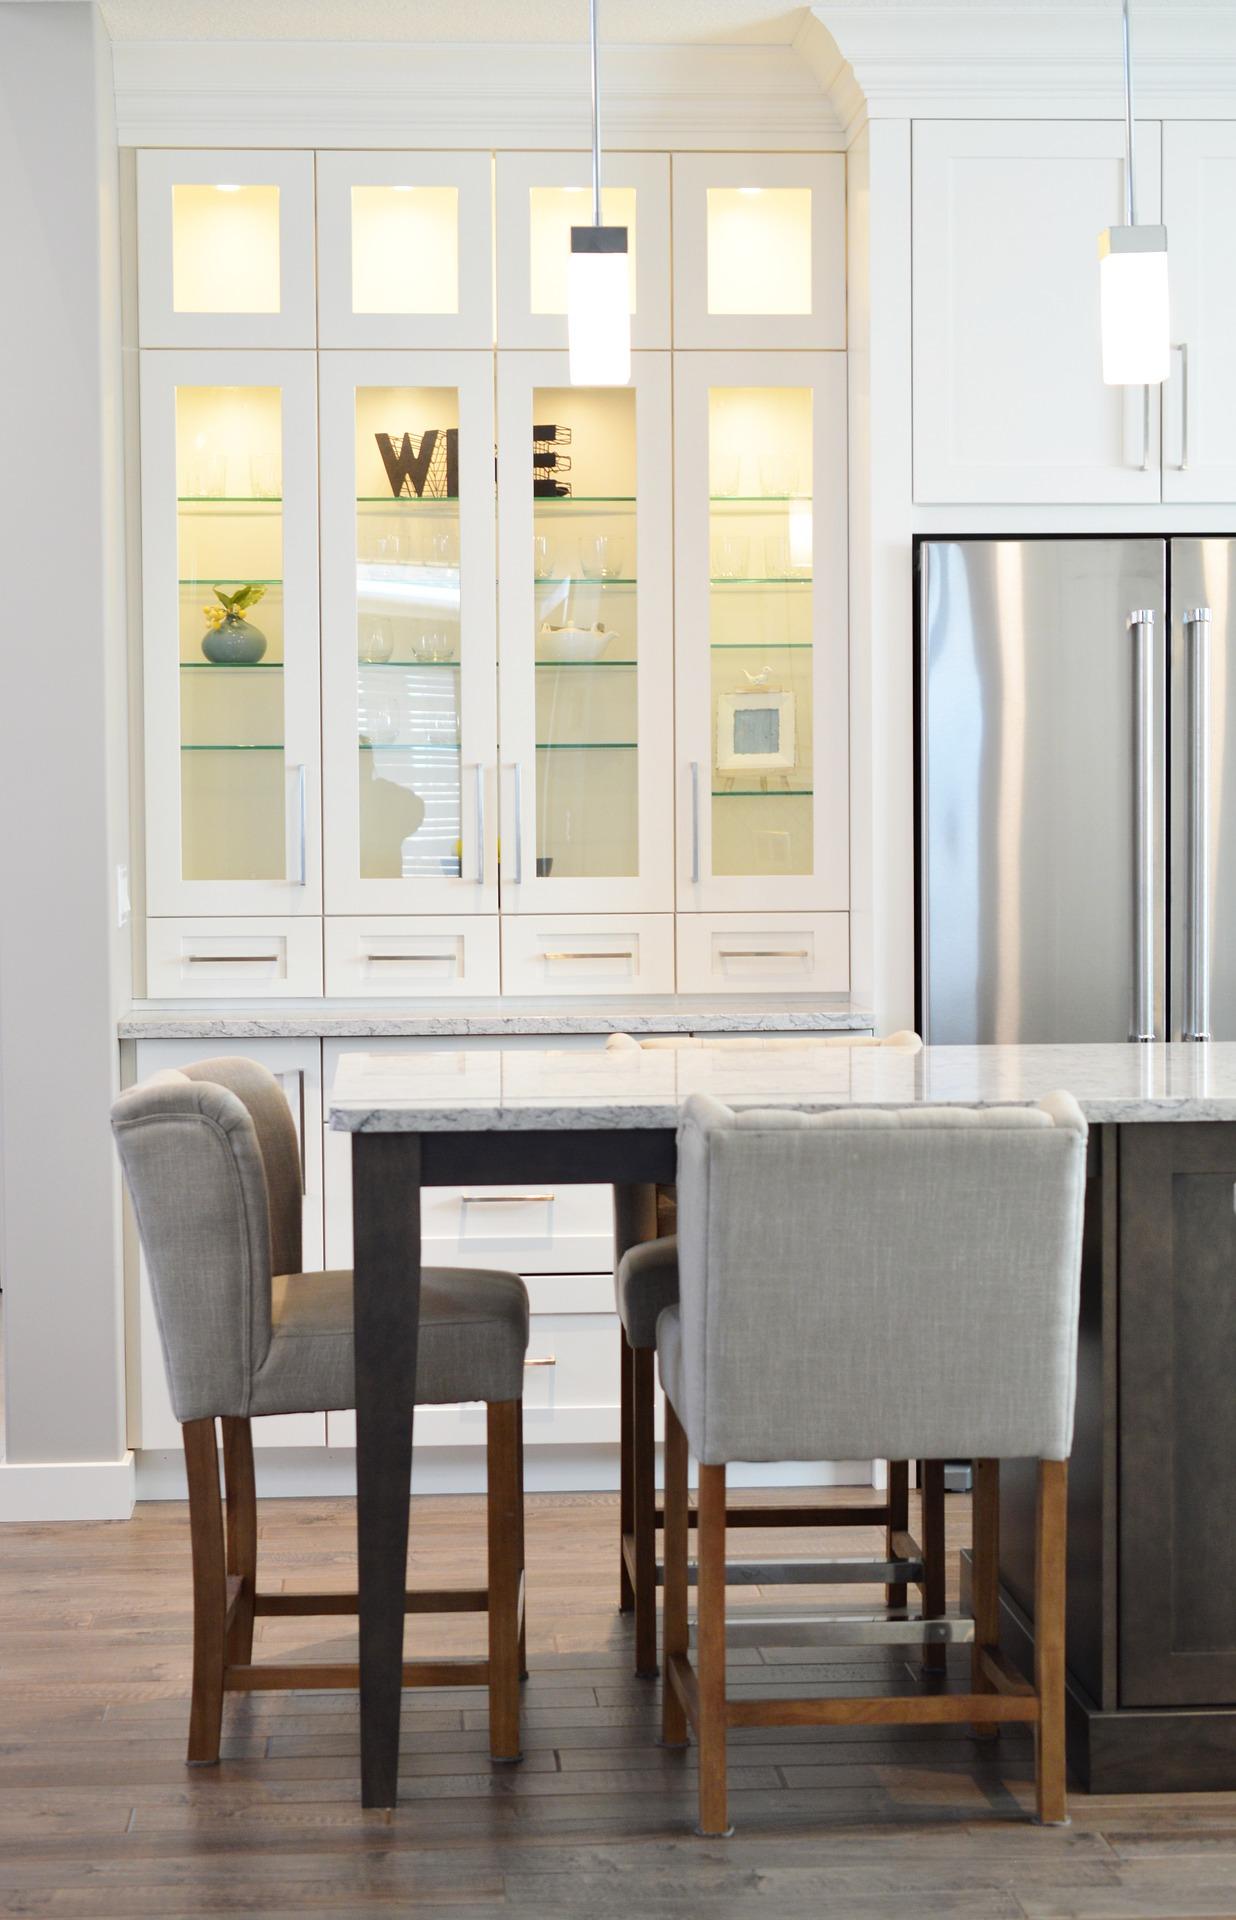 5 Important Home Improvements for your Elderly Parents